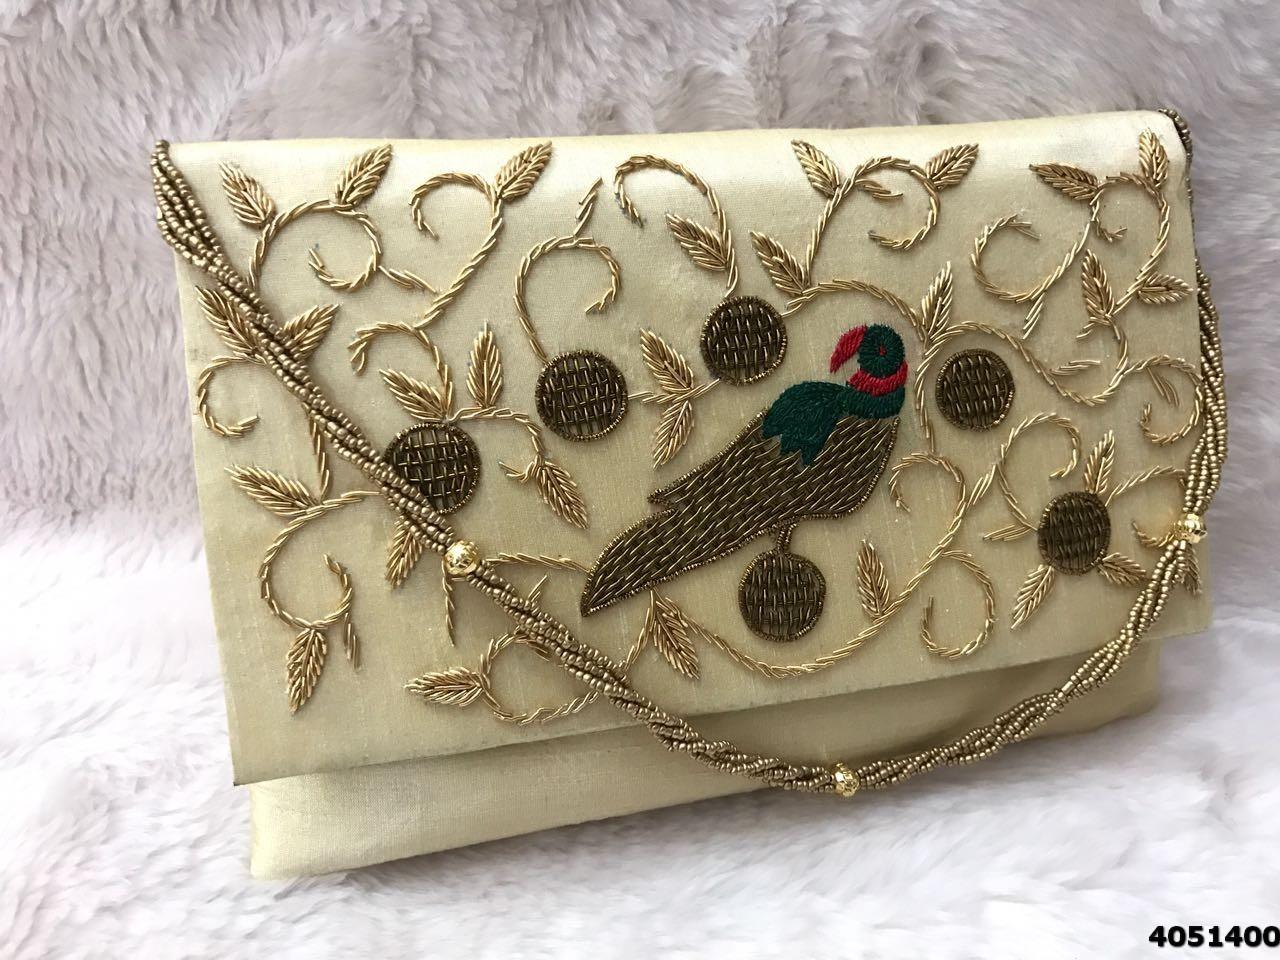 Sensational Embroidered Clutch Bag